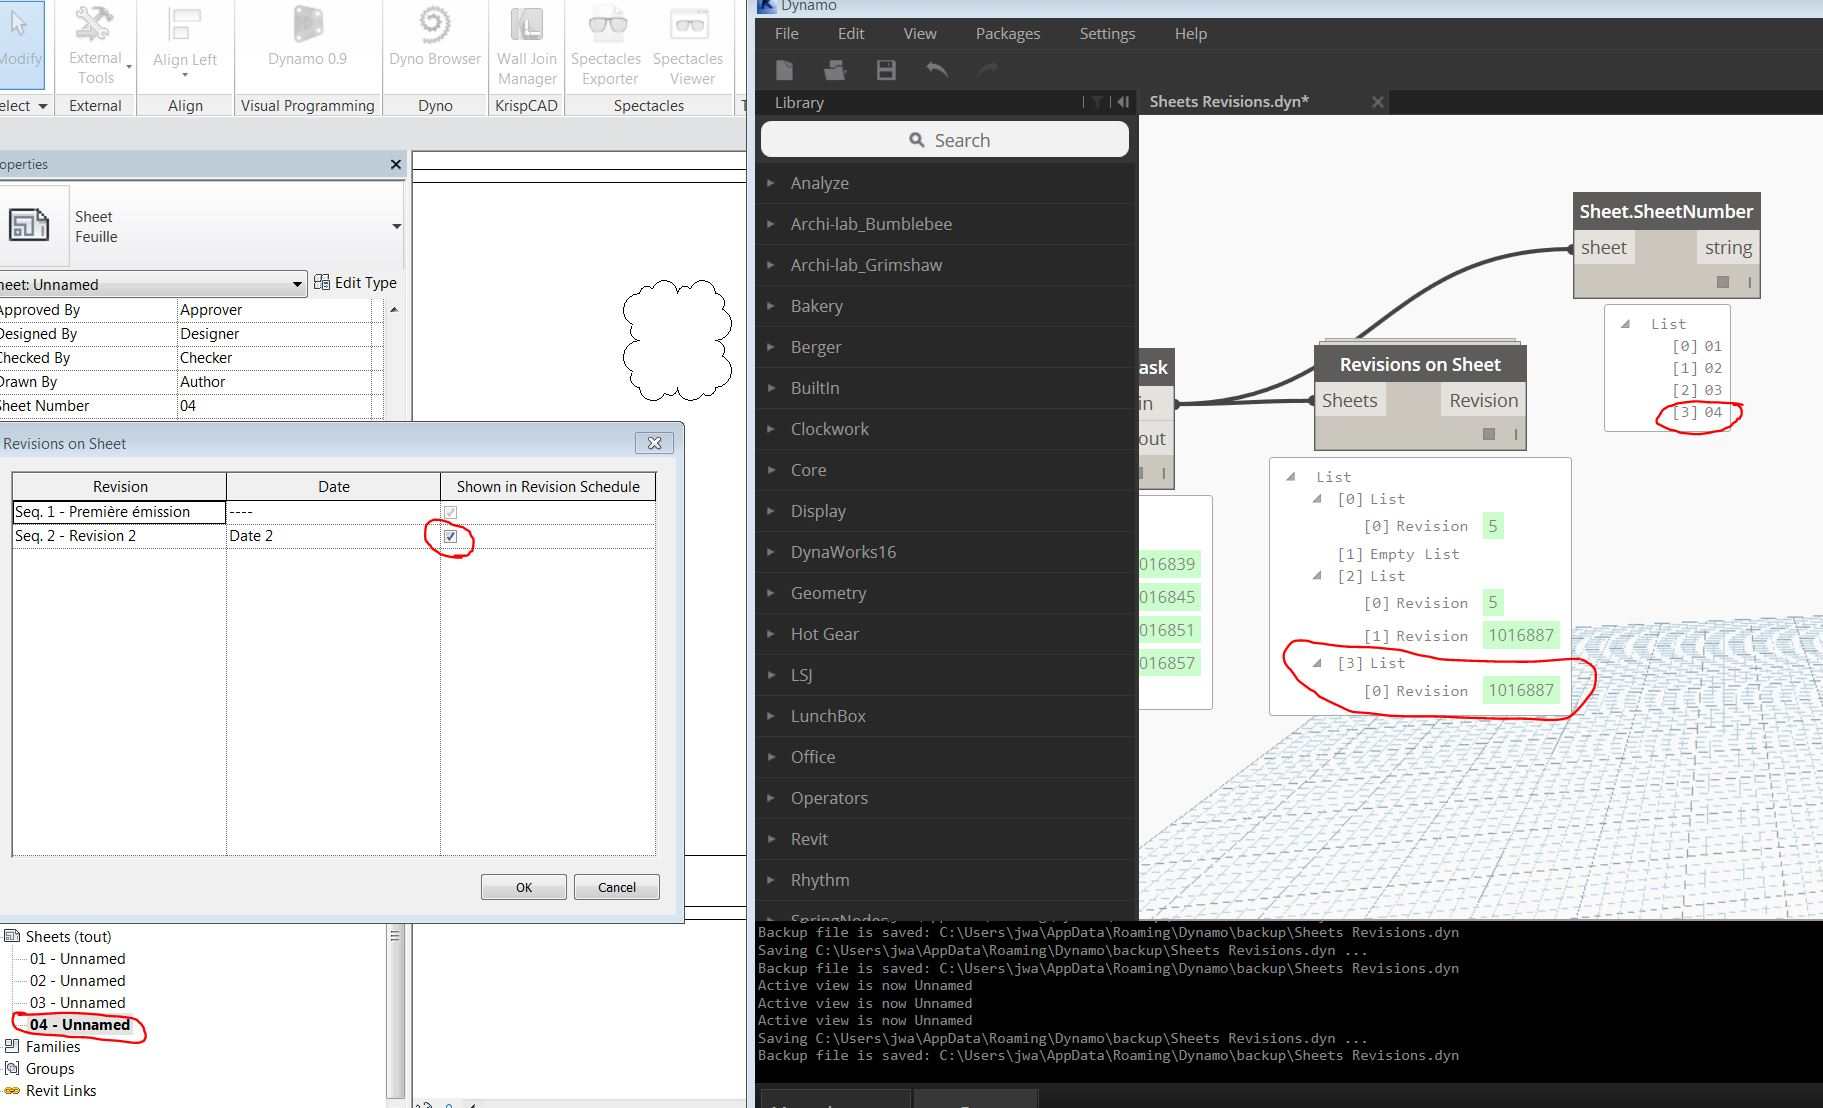 revisions on sheet w/ dynamo | archi-lab